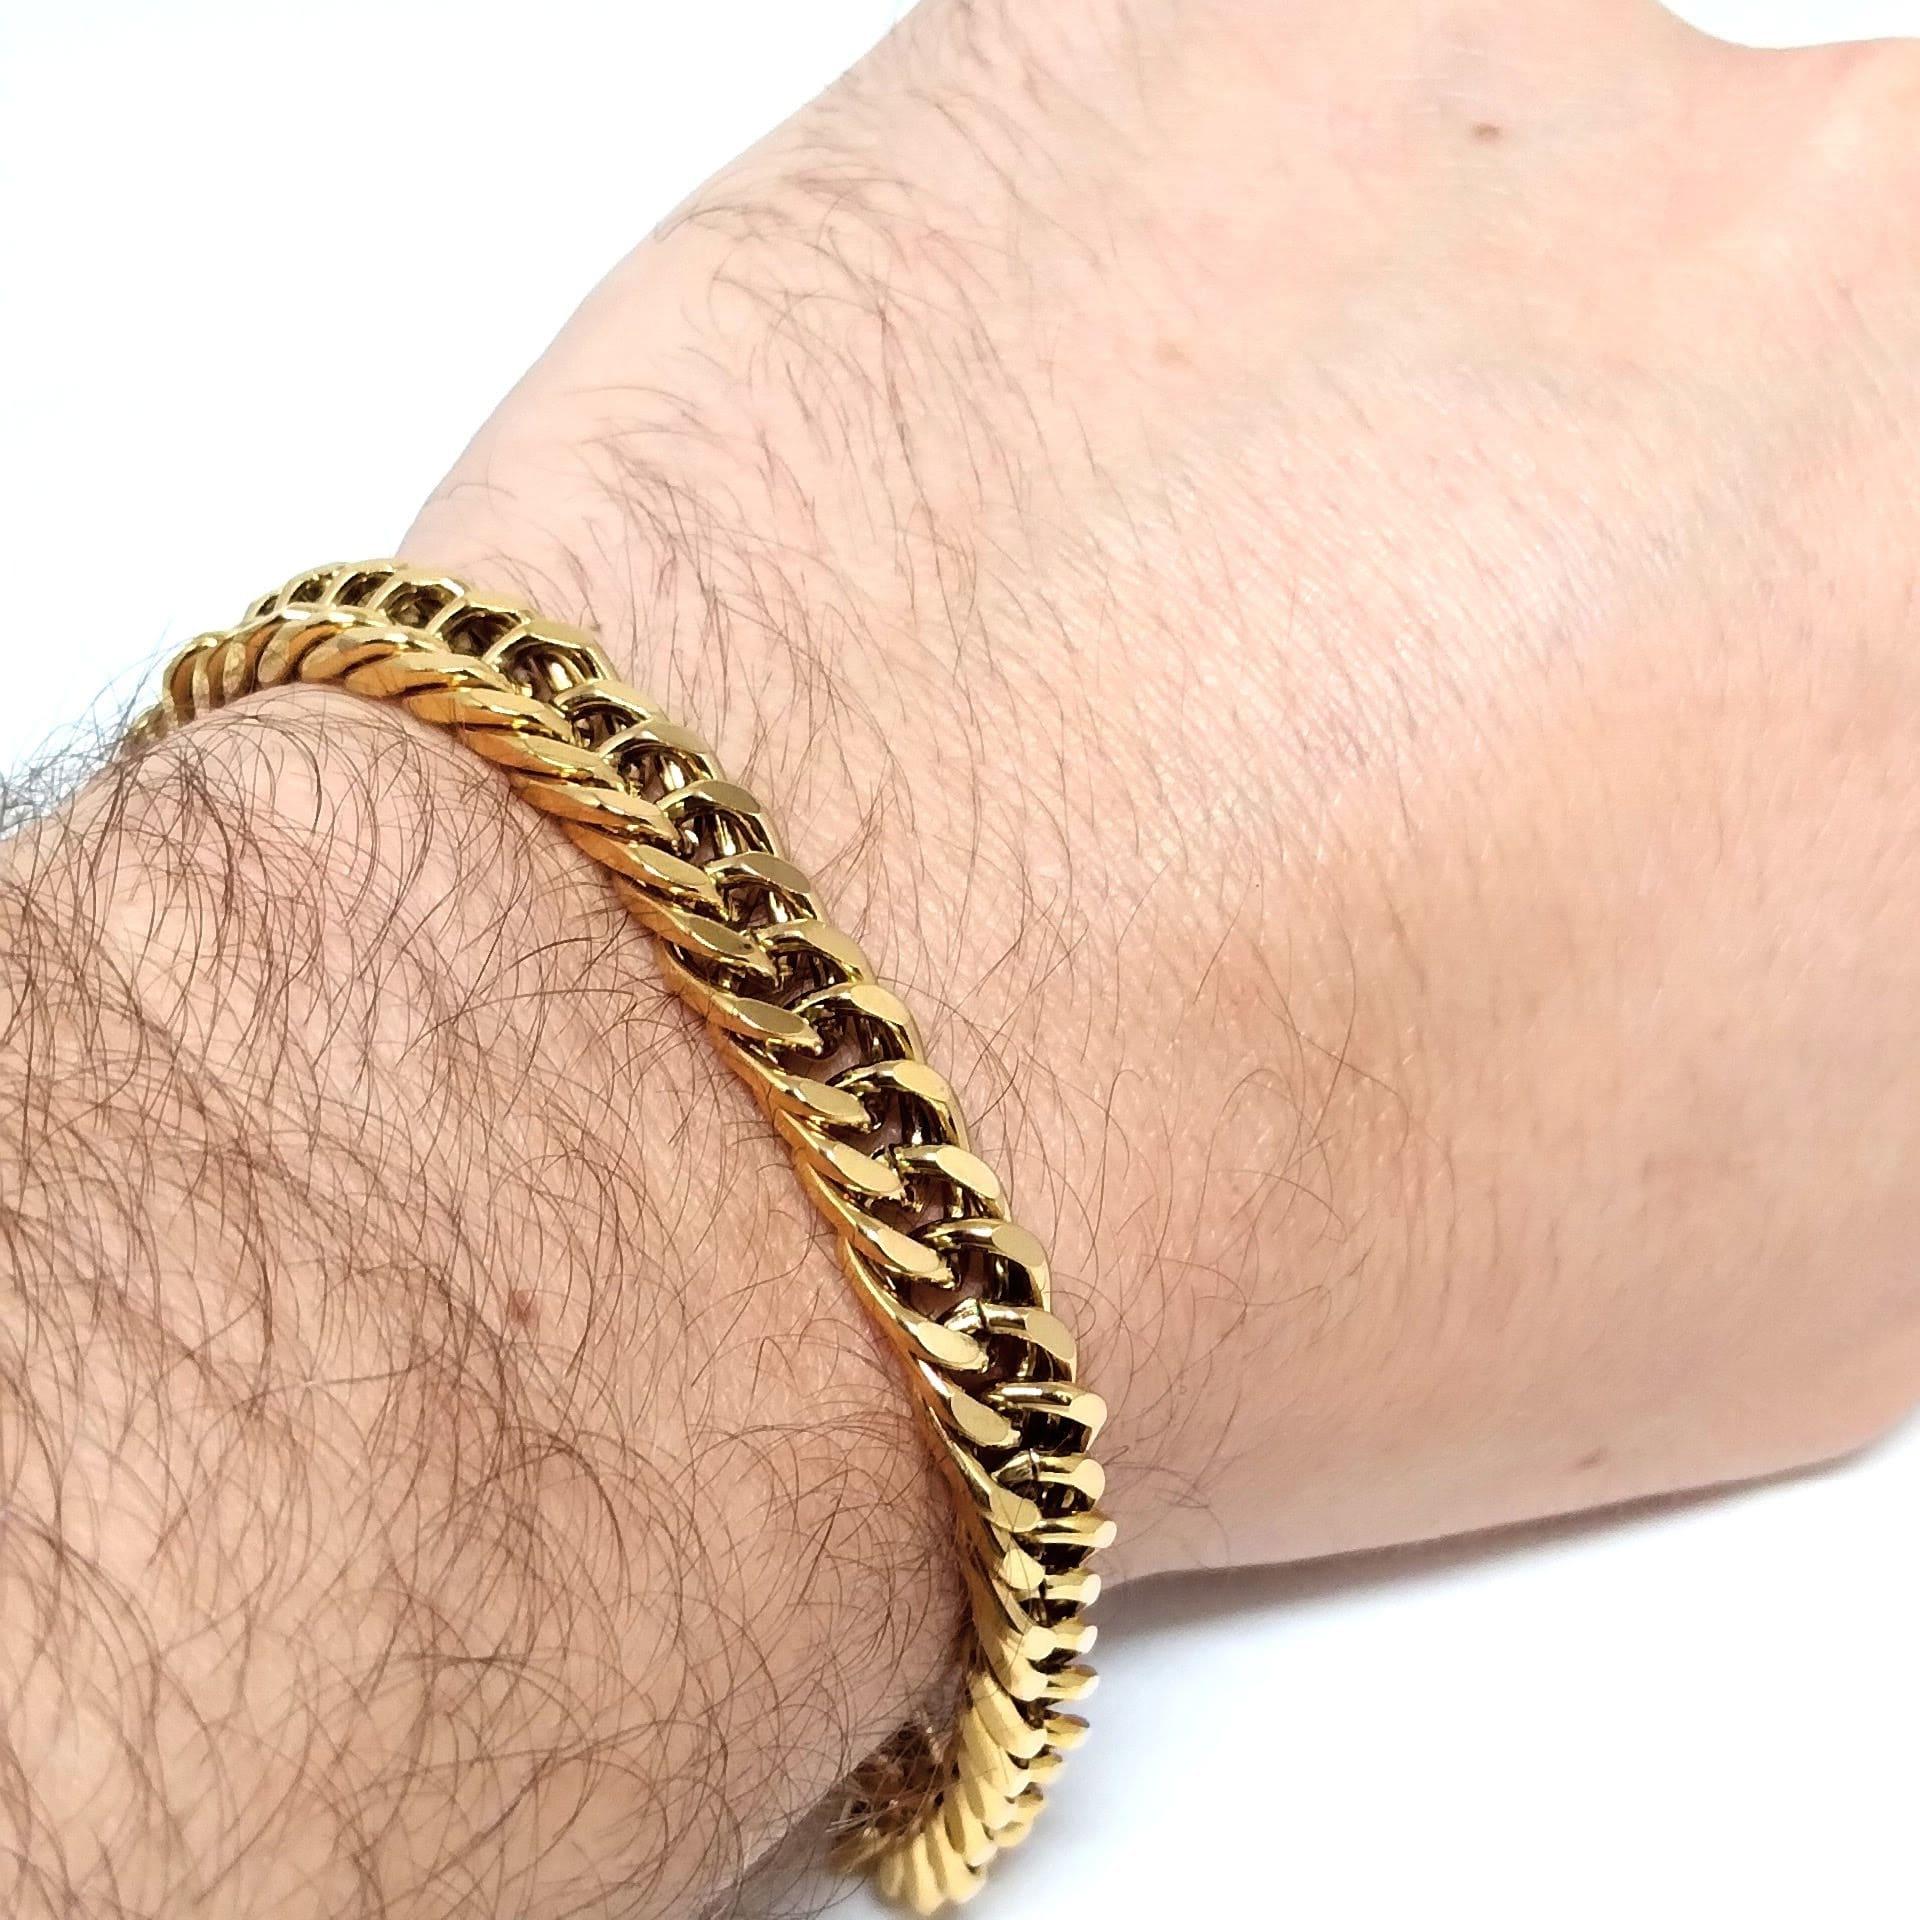 Pulseira Masculina Groumet Banhada Ouro 18k 23cm 8,5mm